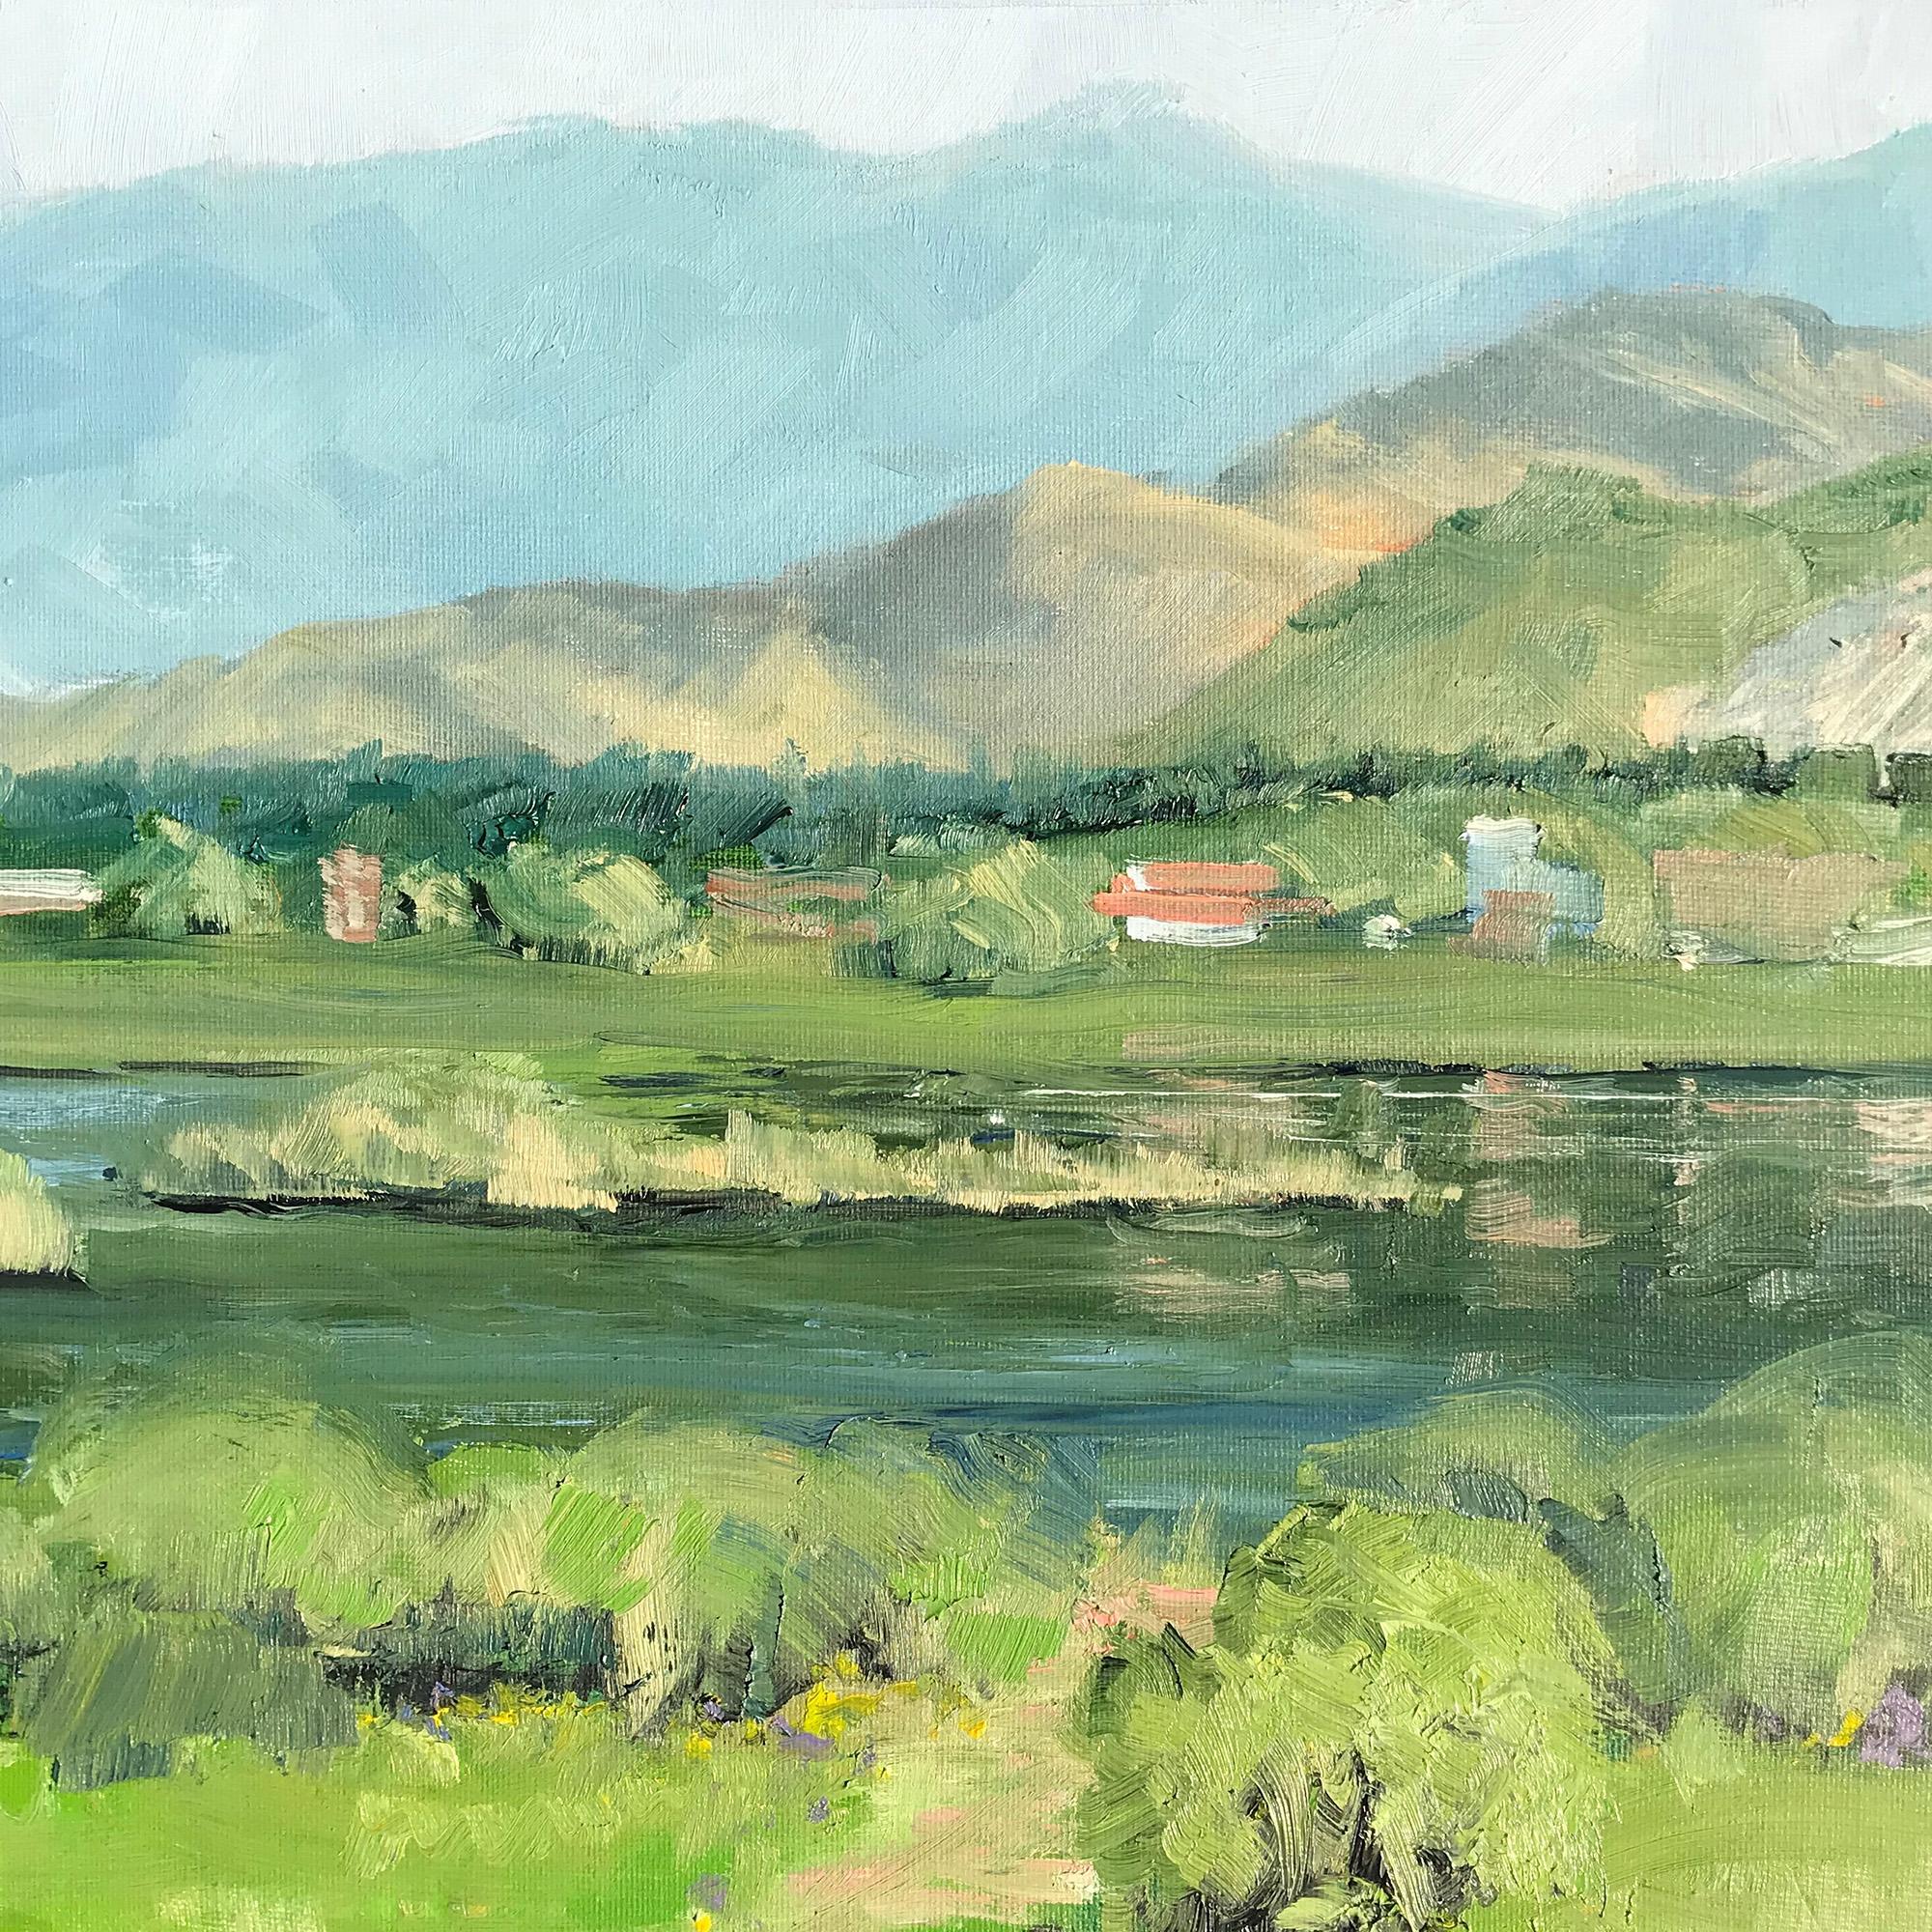 Plein Air Painting at sunrise at Deer Creek Reservoir